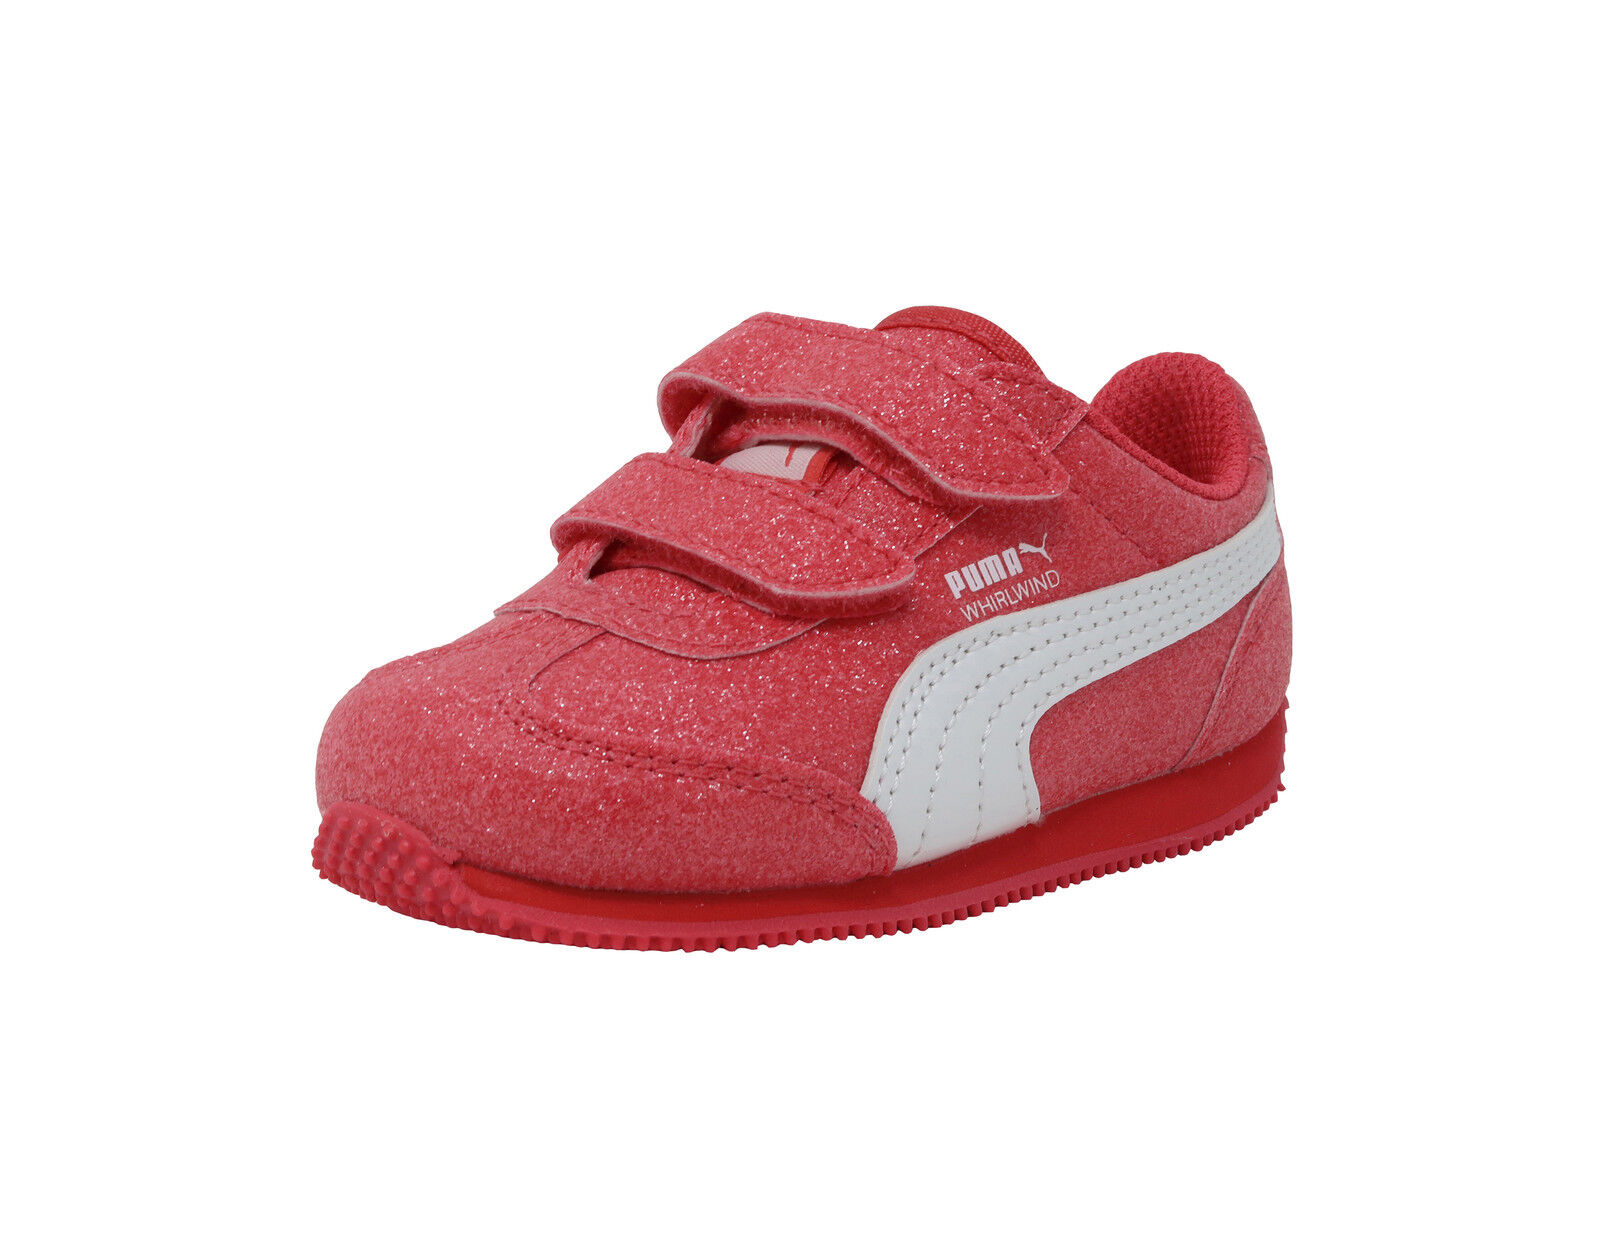 PUMA Shoes Girls Whirlwind Glitz V